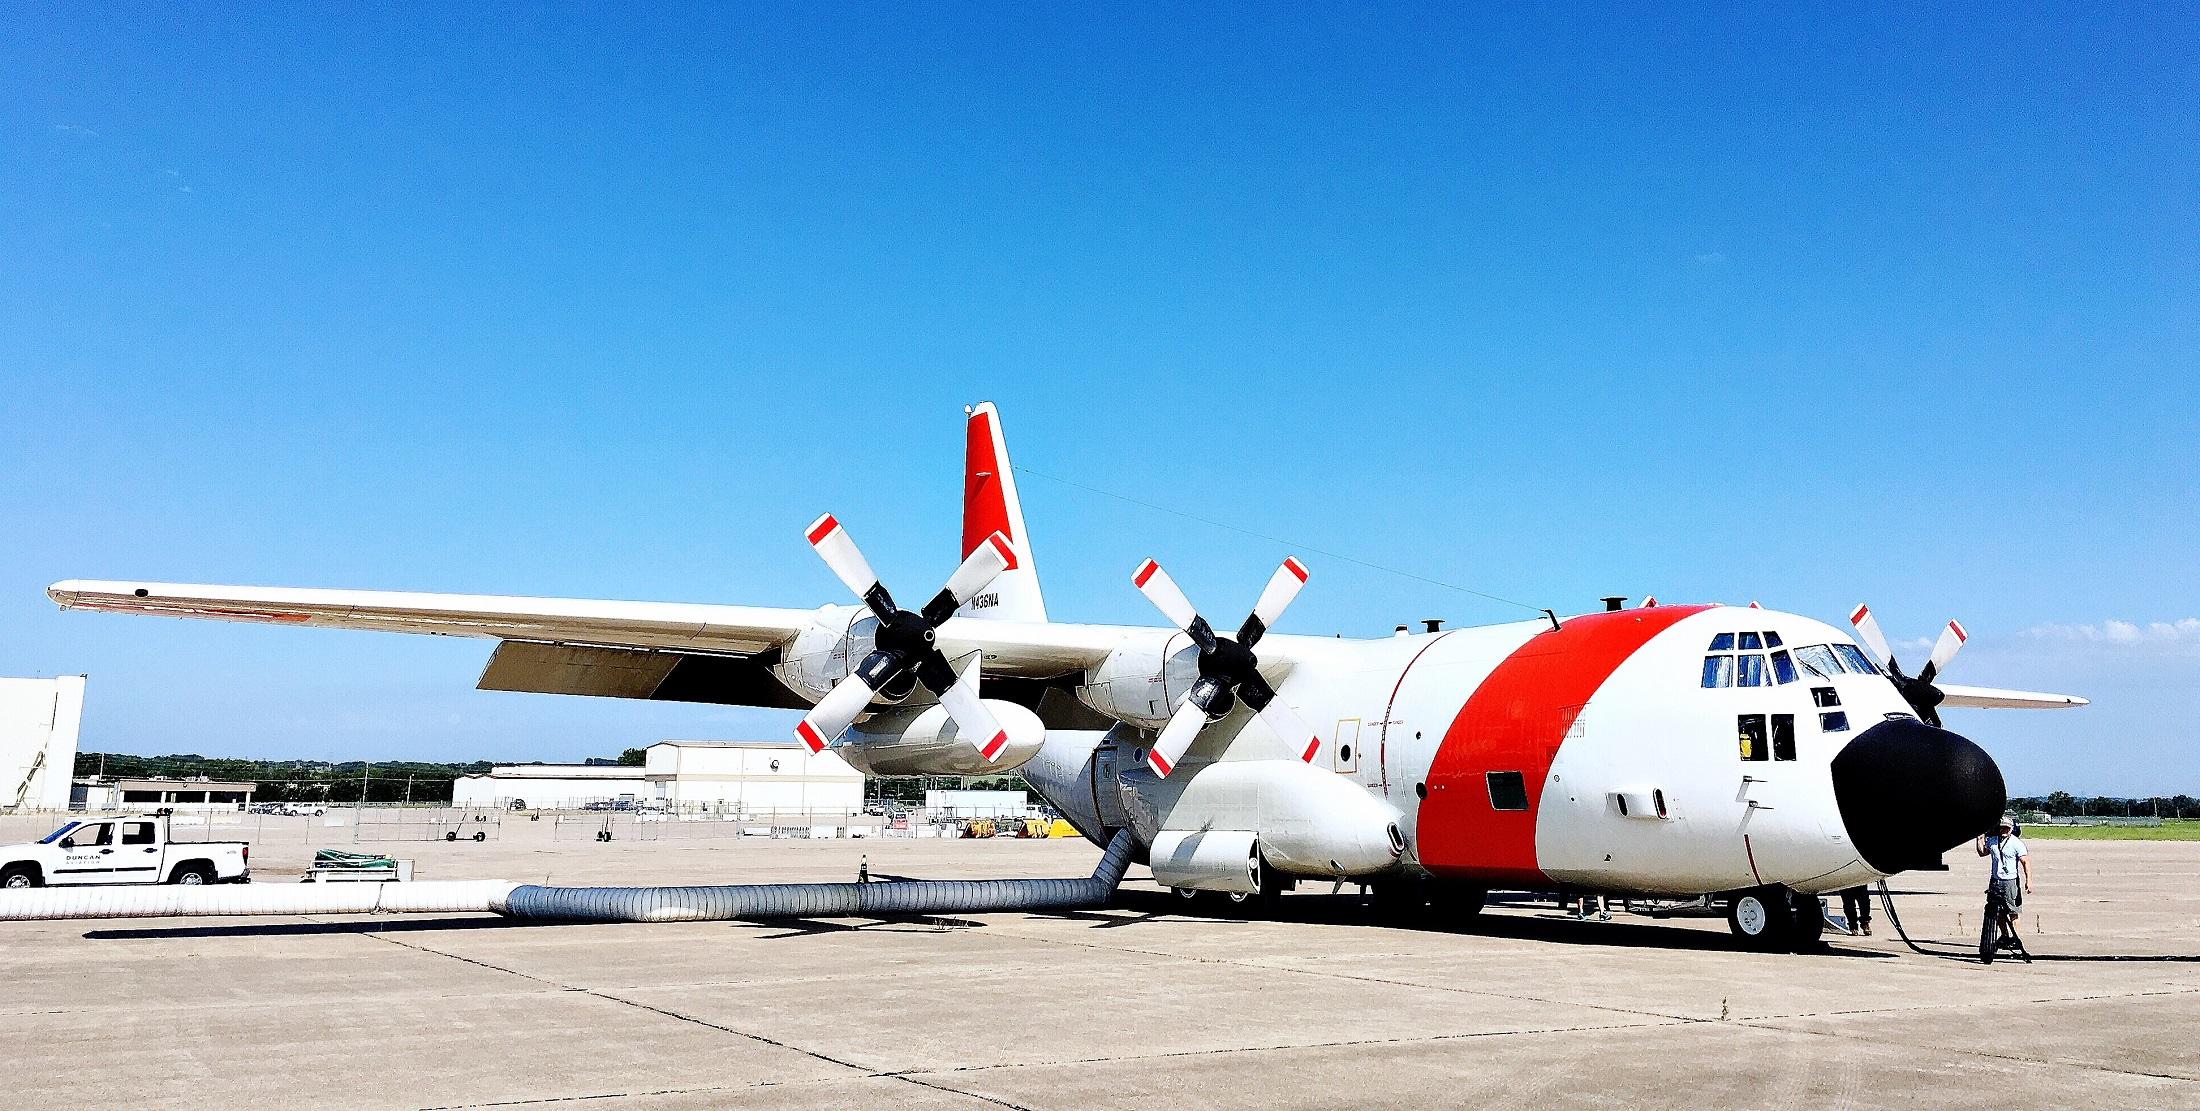 ACTAmerica NASA Earth Expeditions - Examples future planes look according nasa